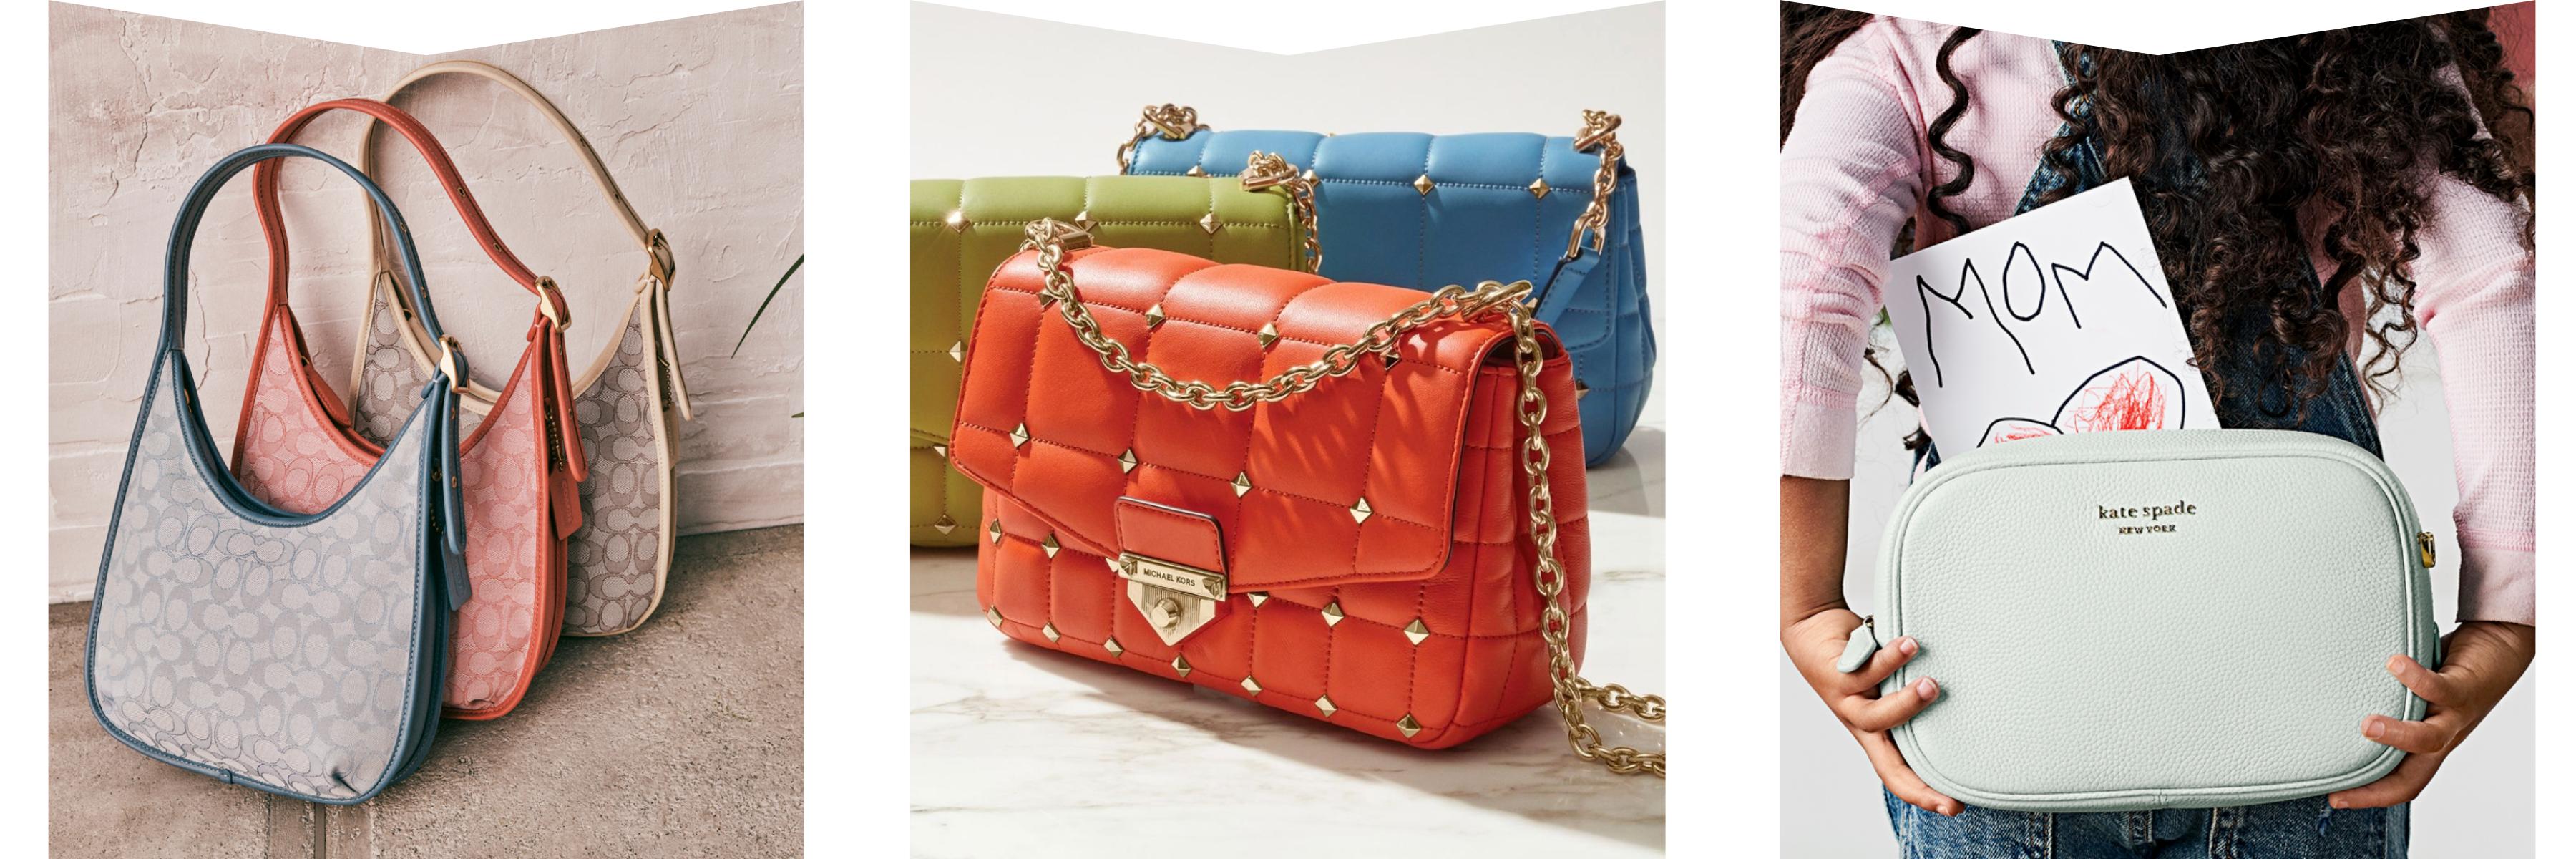 Coach, Michael Kors & Kate Spade handbags